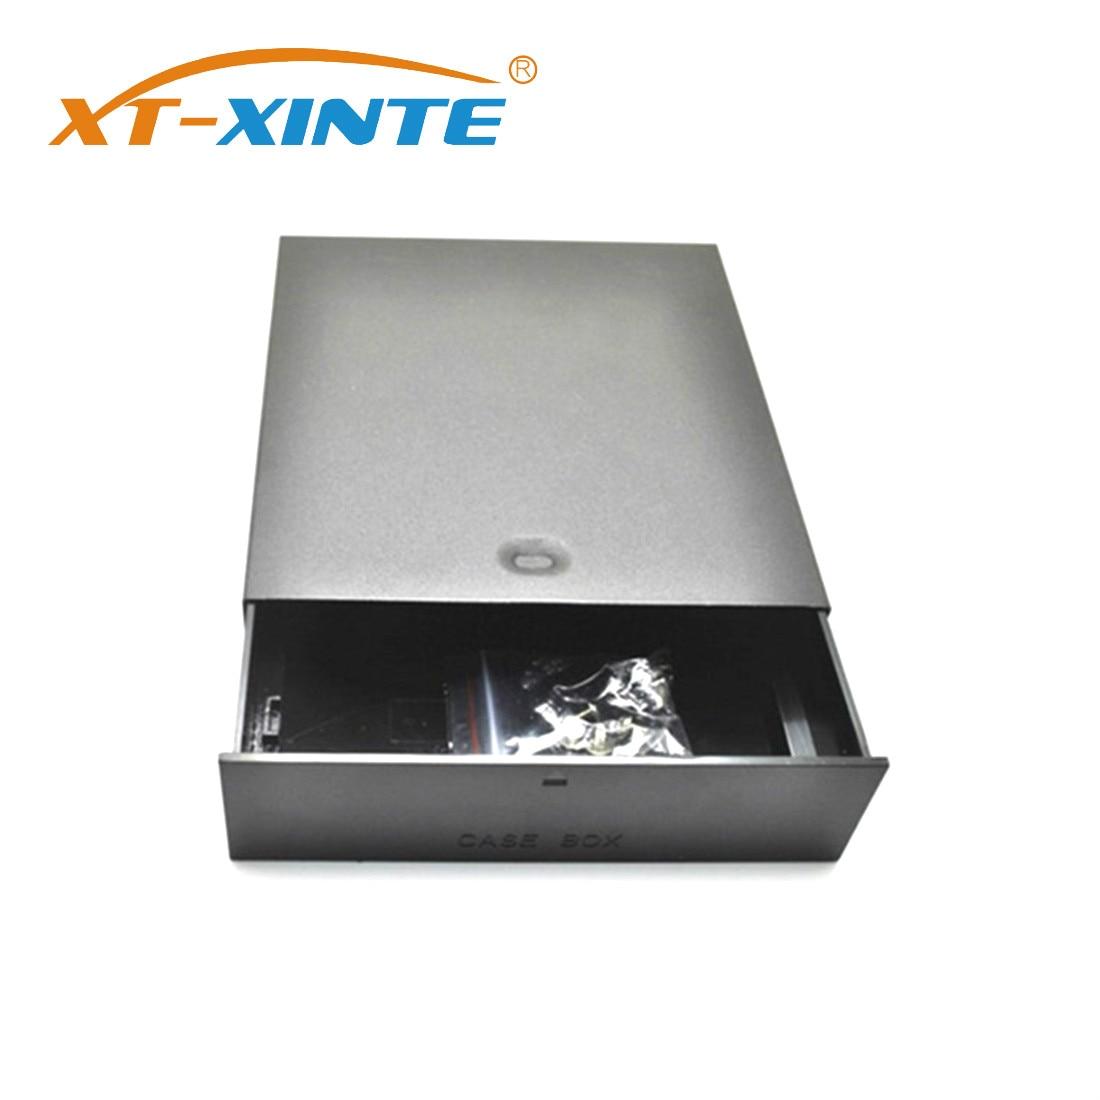 XT-XINTE 5.25